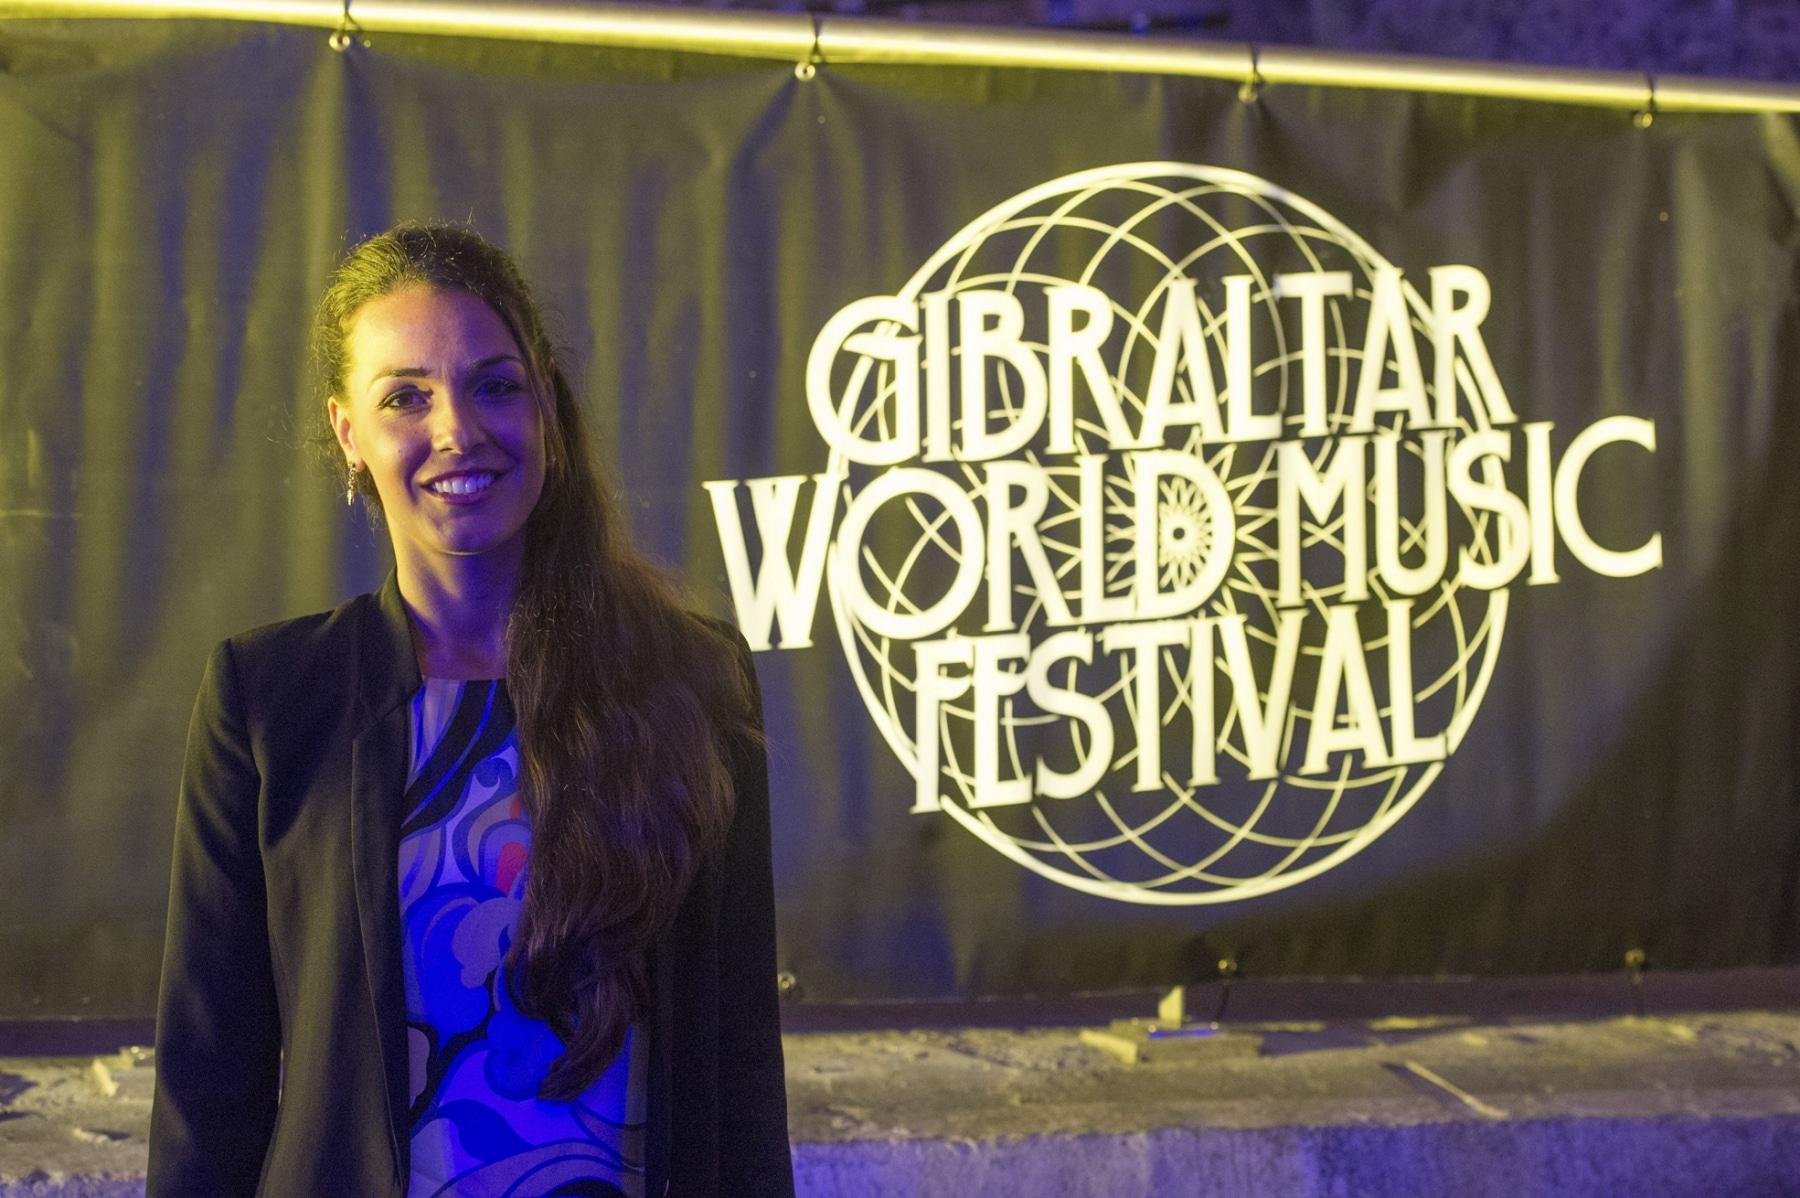 19-mayo-gibraltar-world-music-festival29_14461043601_o